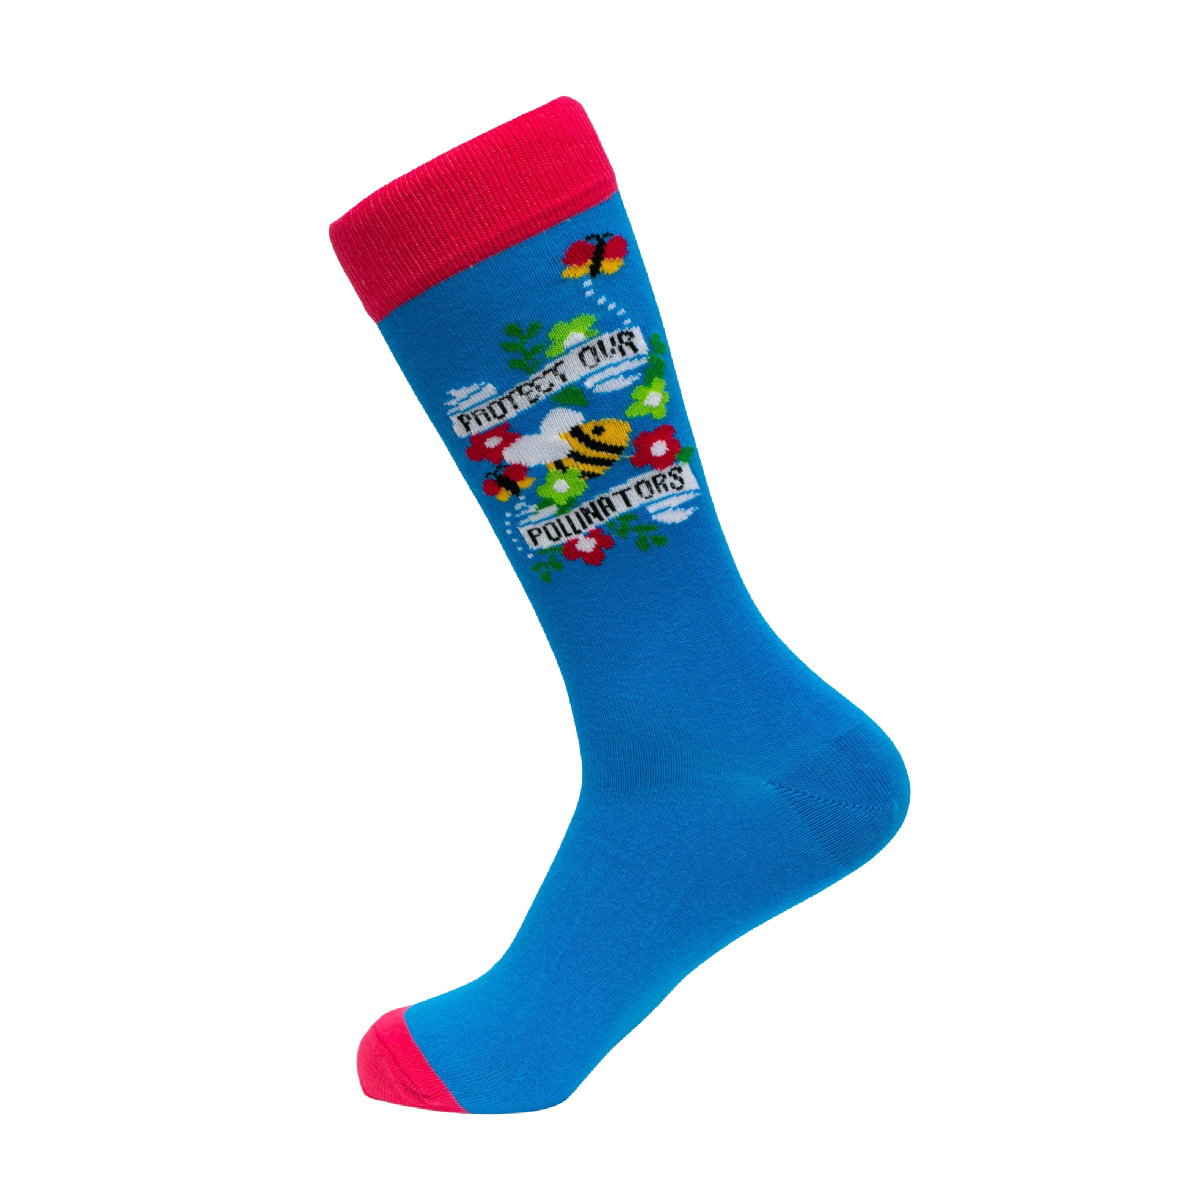 Socks Atomica Socks Atomica Pollinators